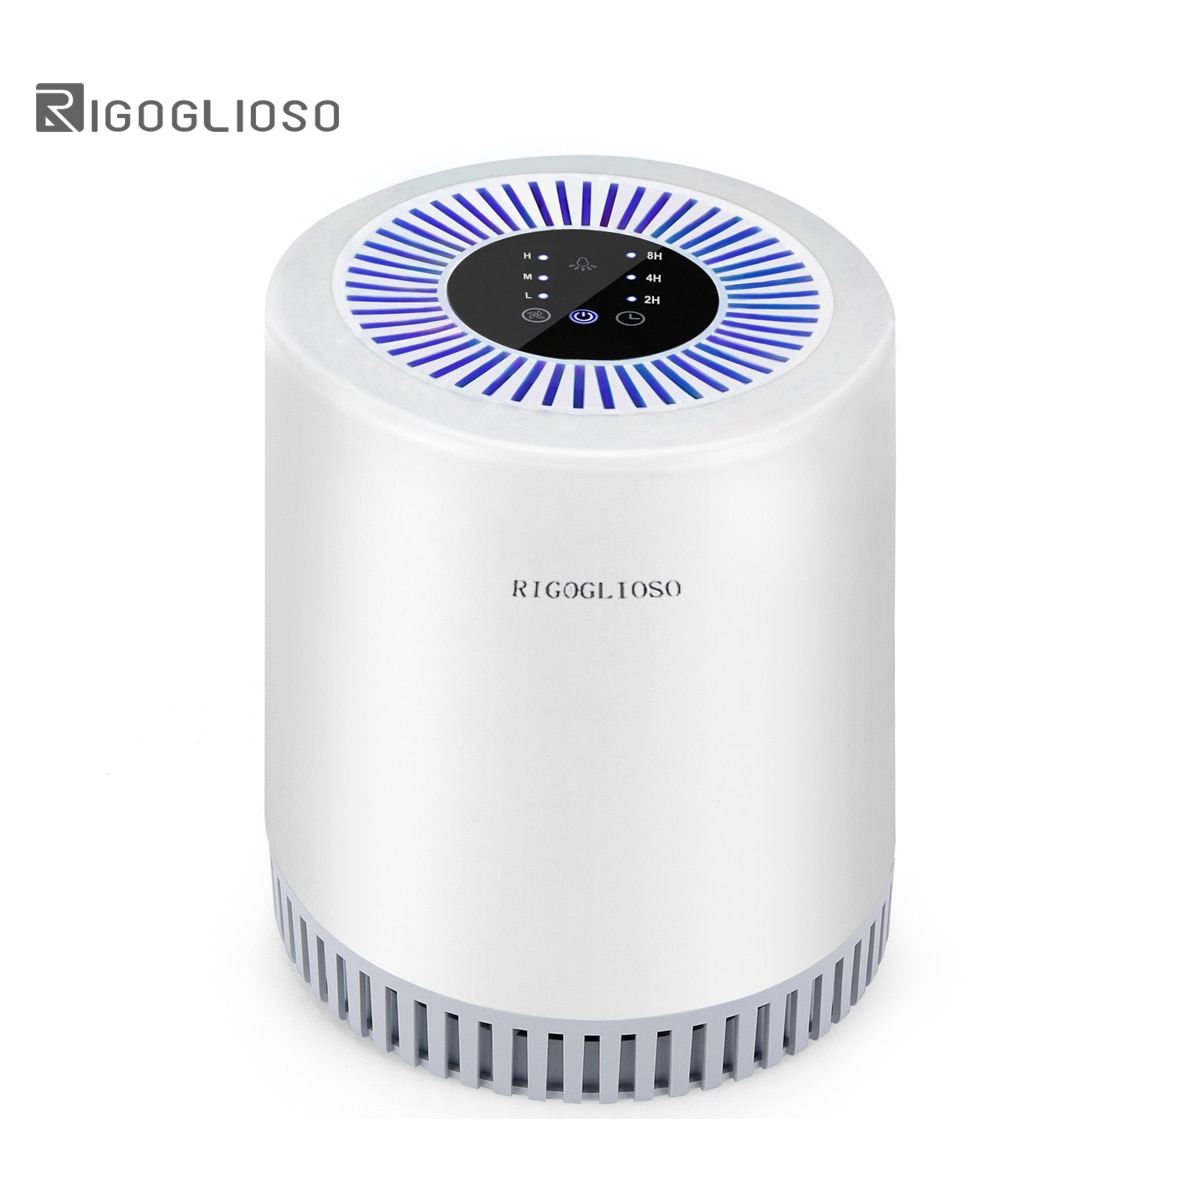 RIGOGLIOSO air purifier for home car air purifier filter ture hepa carbon three-layer filter air cleaner 110-240V EU US UK plug